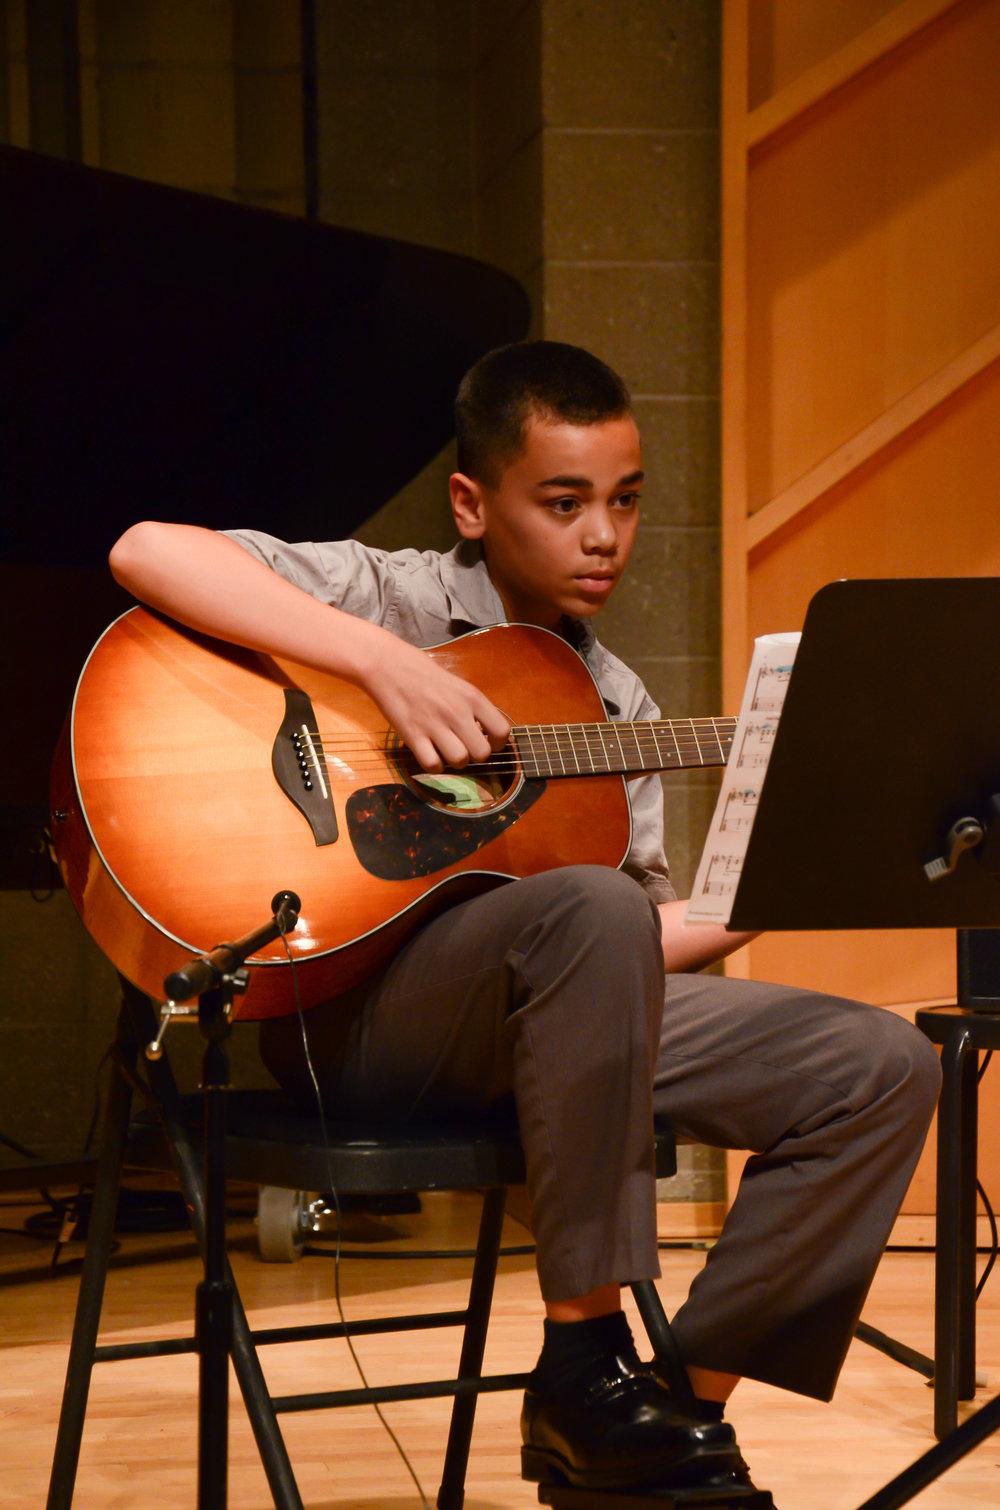 guitar-lessons-in-fort-lee.jpg